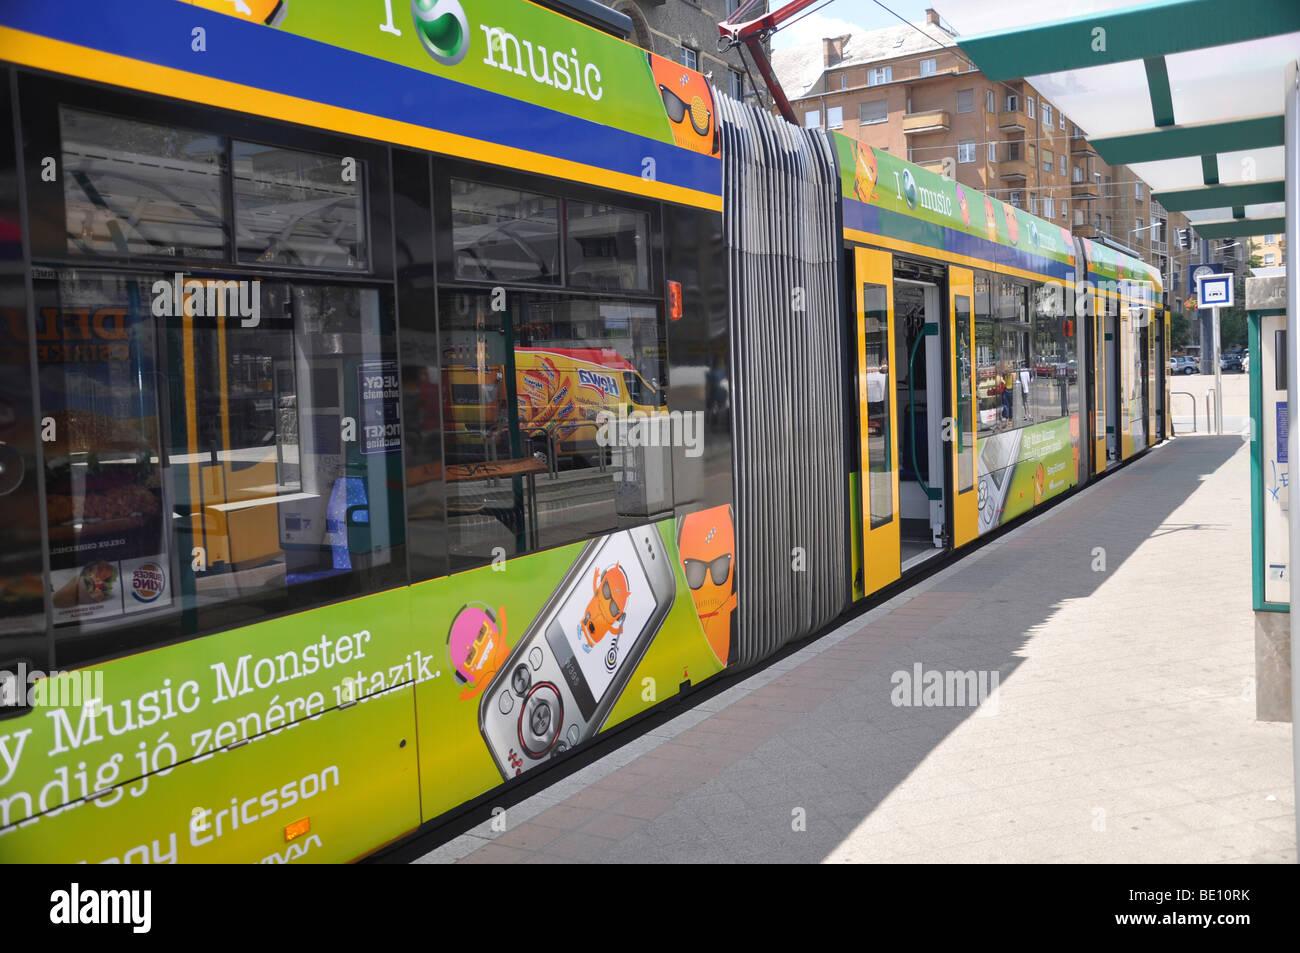 Eastern Europe, Hungary, Budapest, Tram Stock Photo